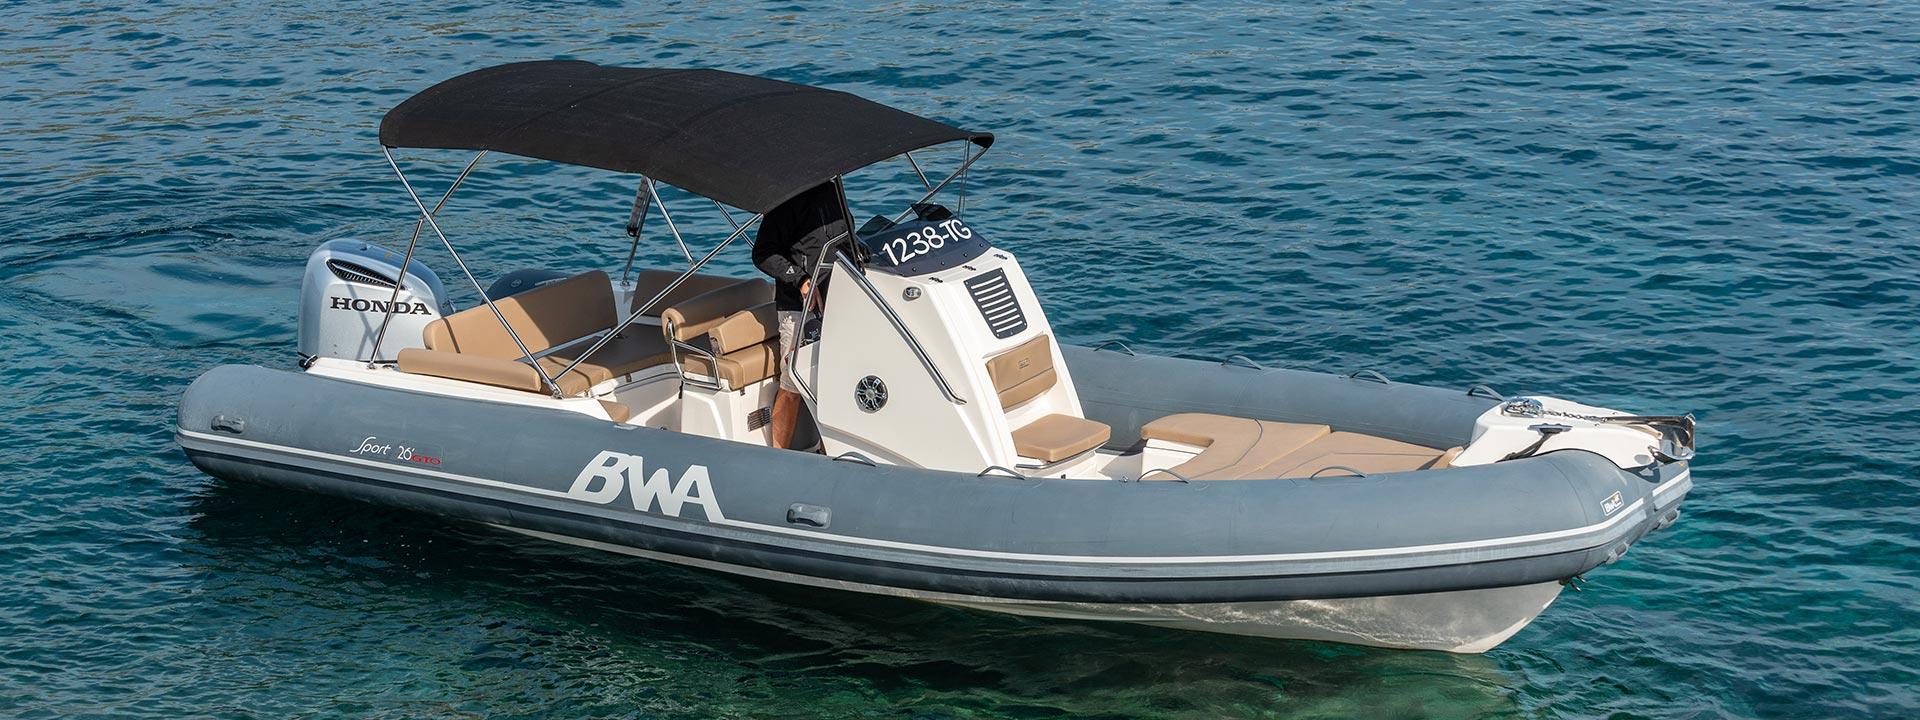 mayer-charter-boat-header-bwa-gto-sport-26-06